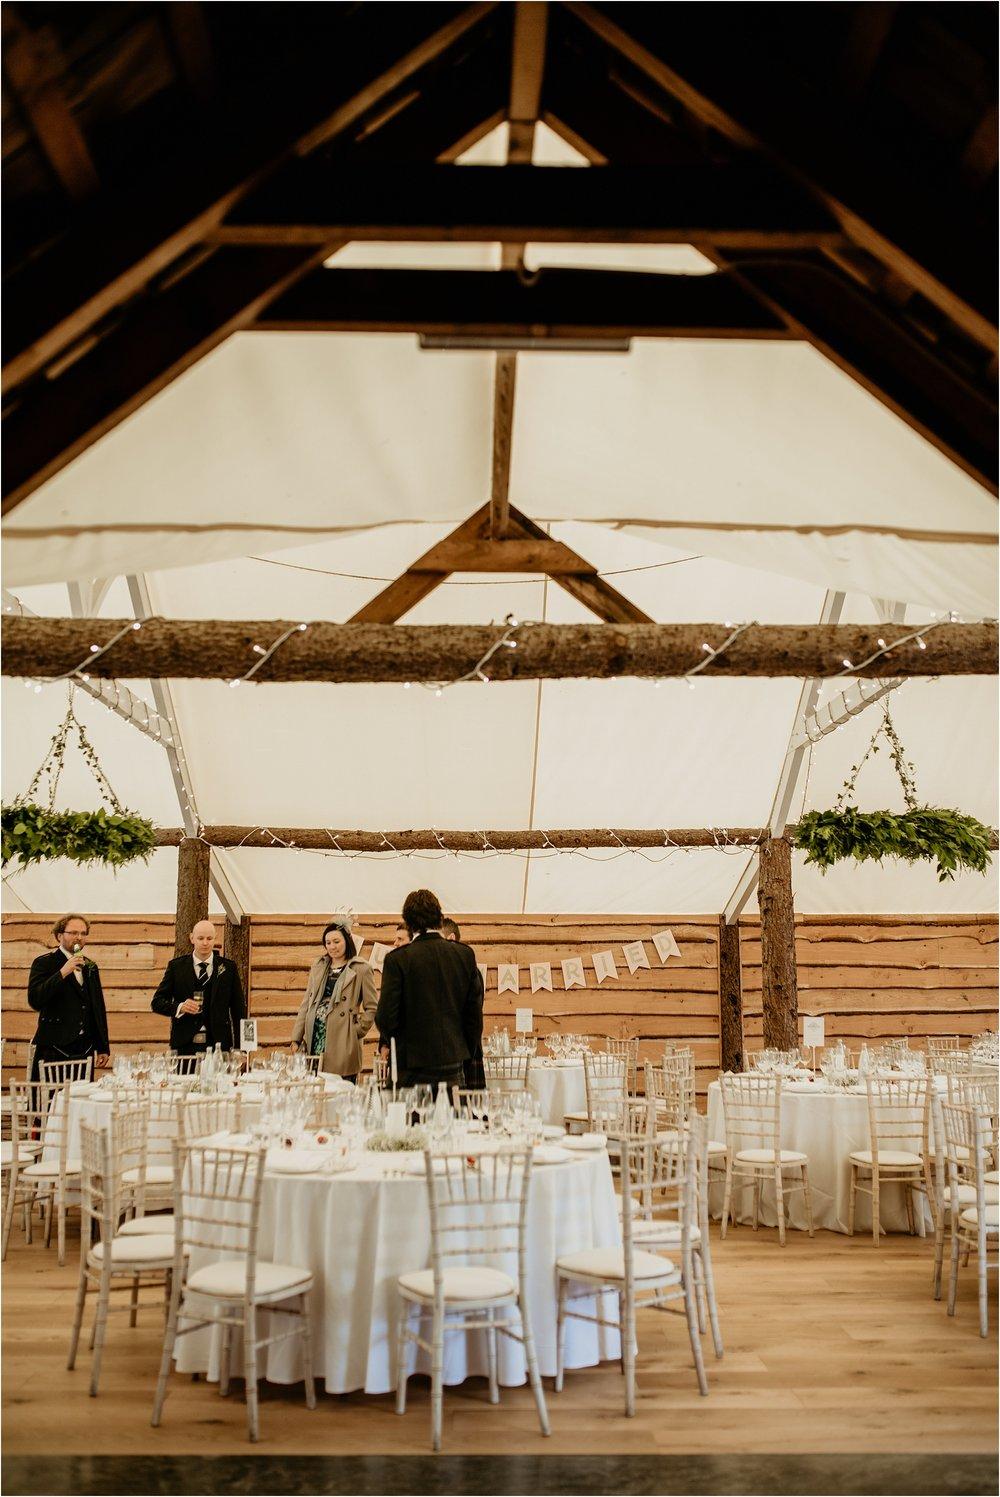 Myres-Castle-Wedding-Photographer_55.jpg